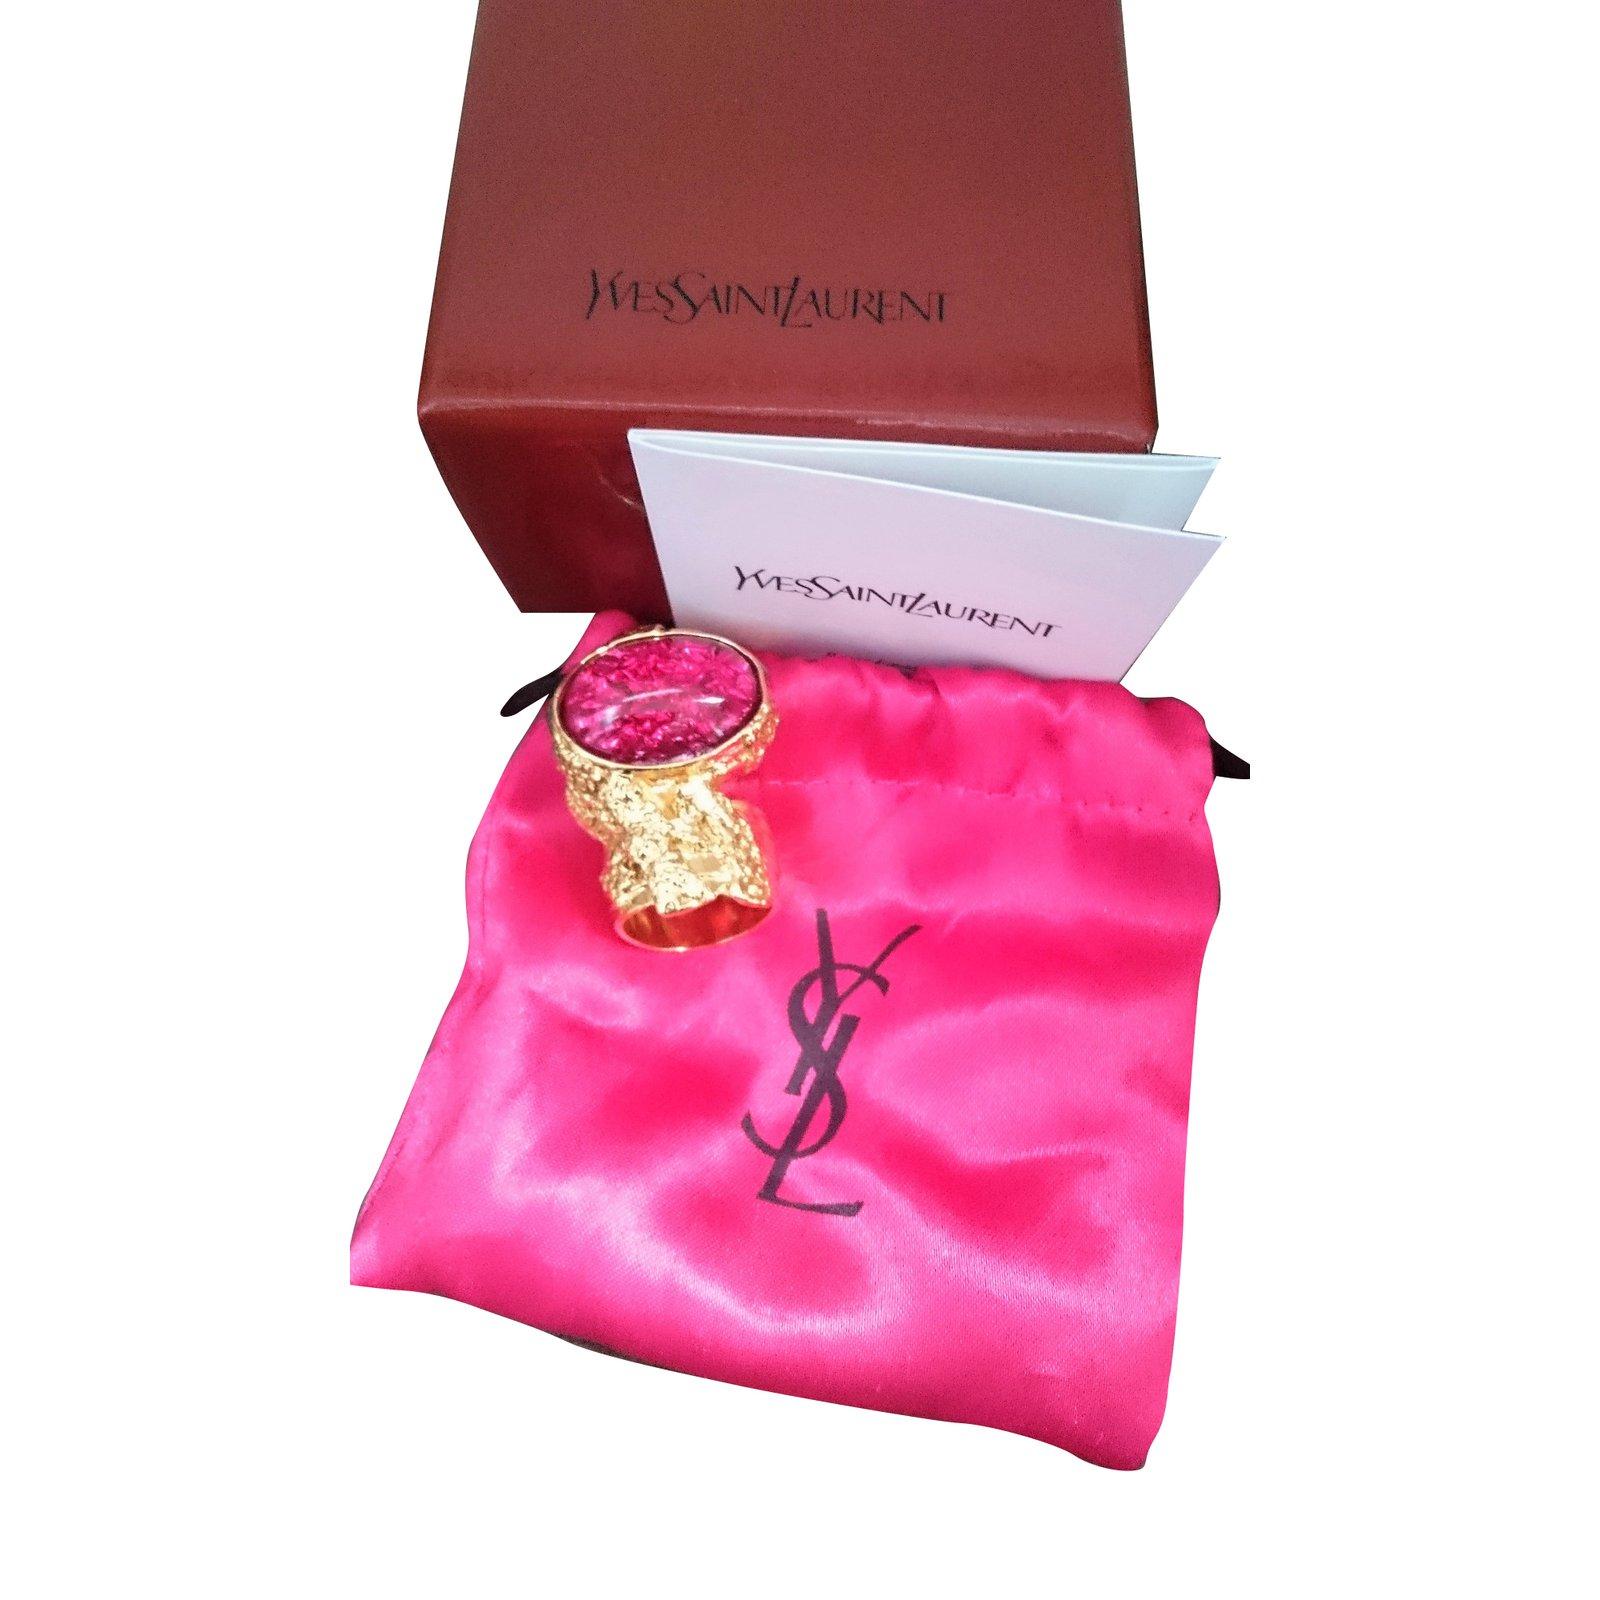 252bce63849 Yves Saint Laurent Arty Ring Love Rings Gold-plated Pink ref.32462 - Joli  Closet